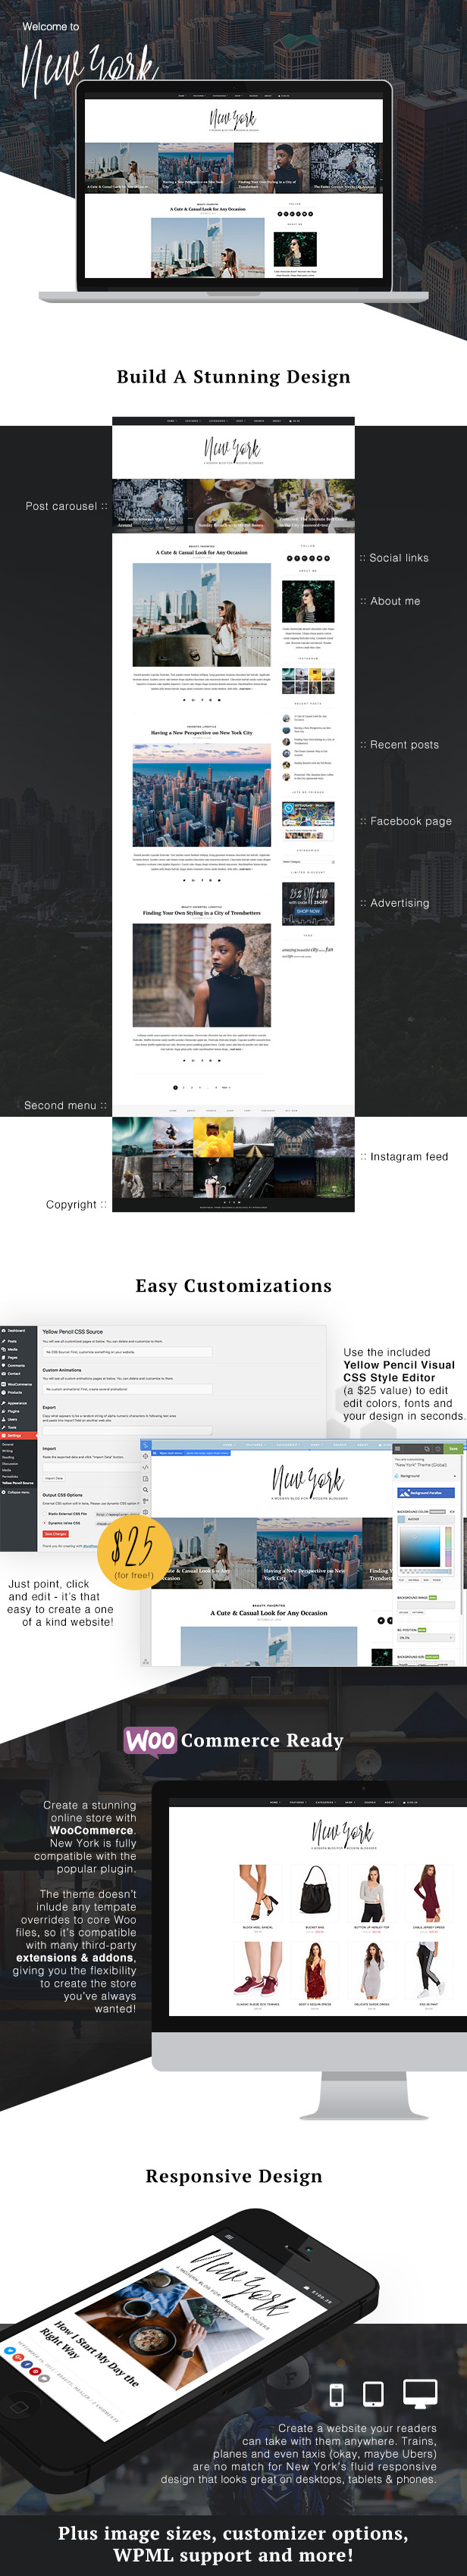 WordPress theme New York - WordPress Blog & Shop Theme (Personal)